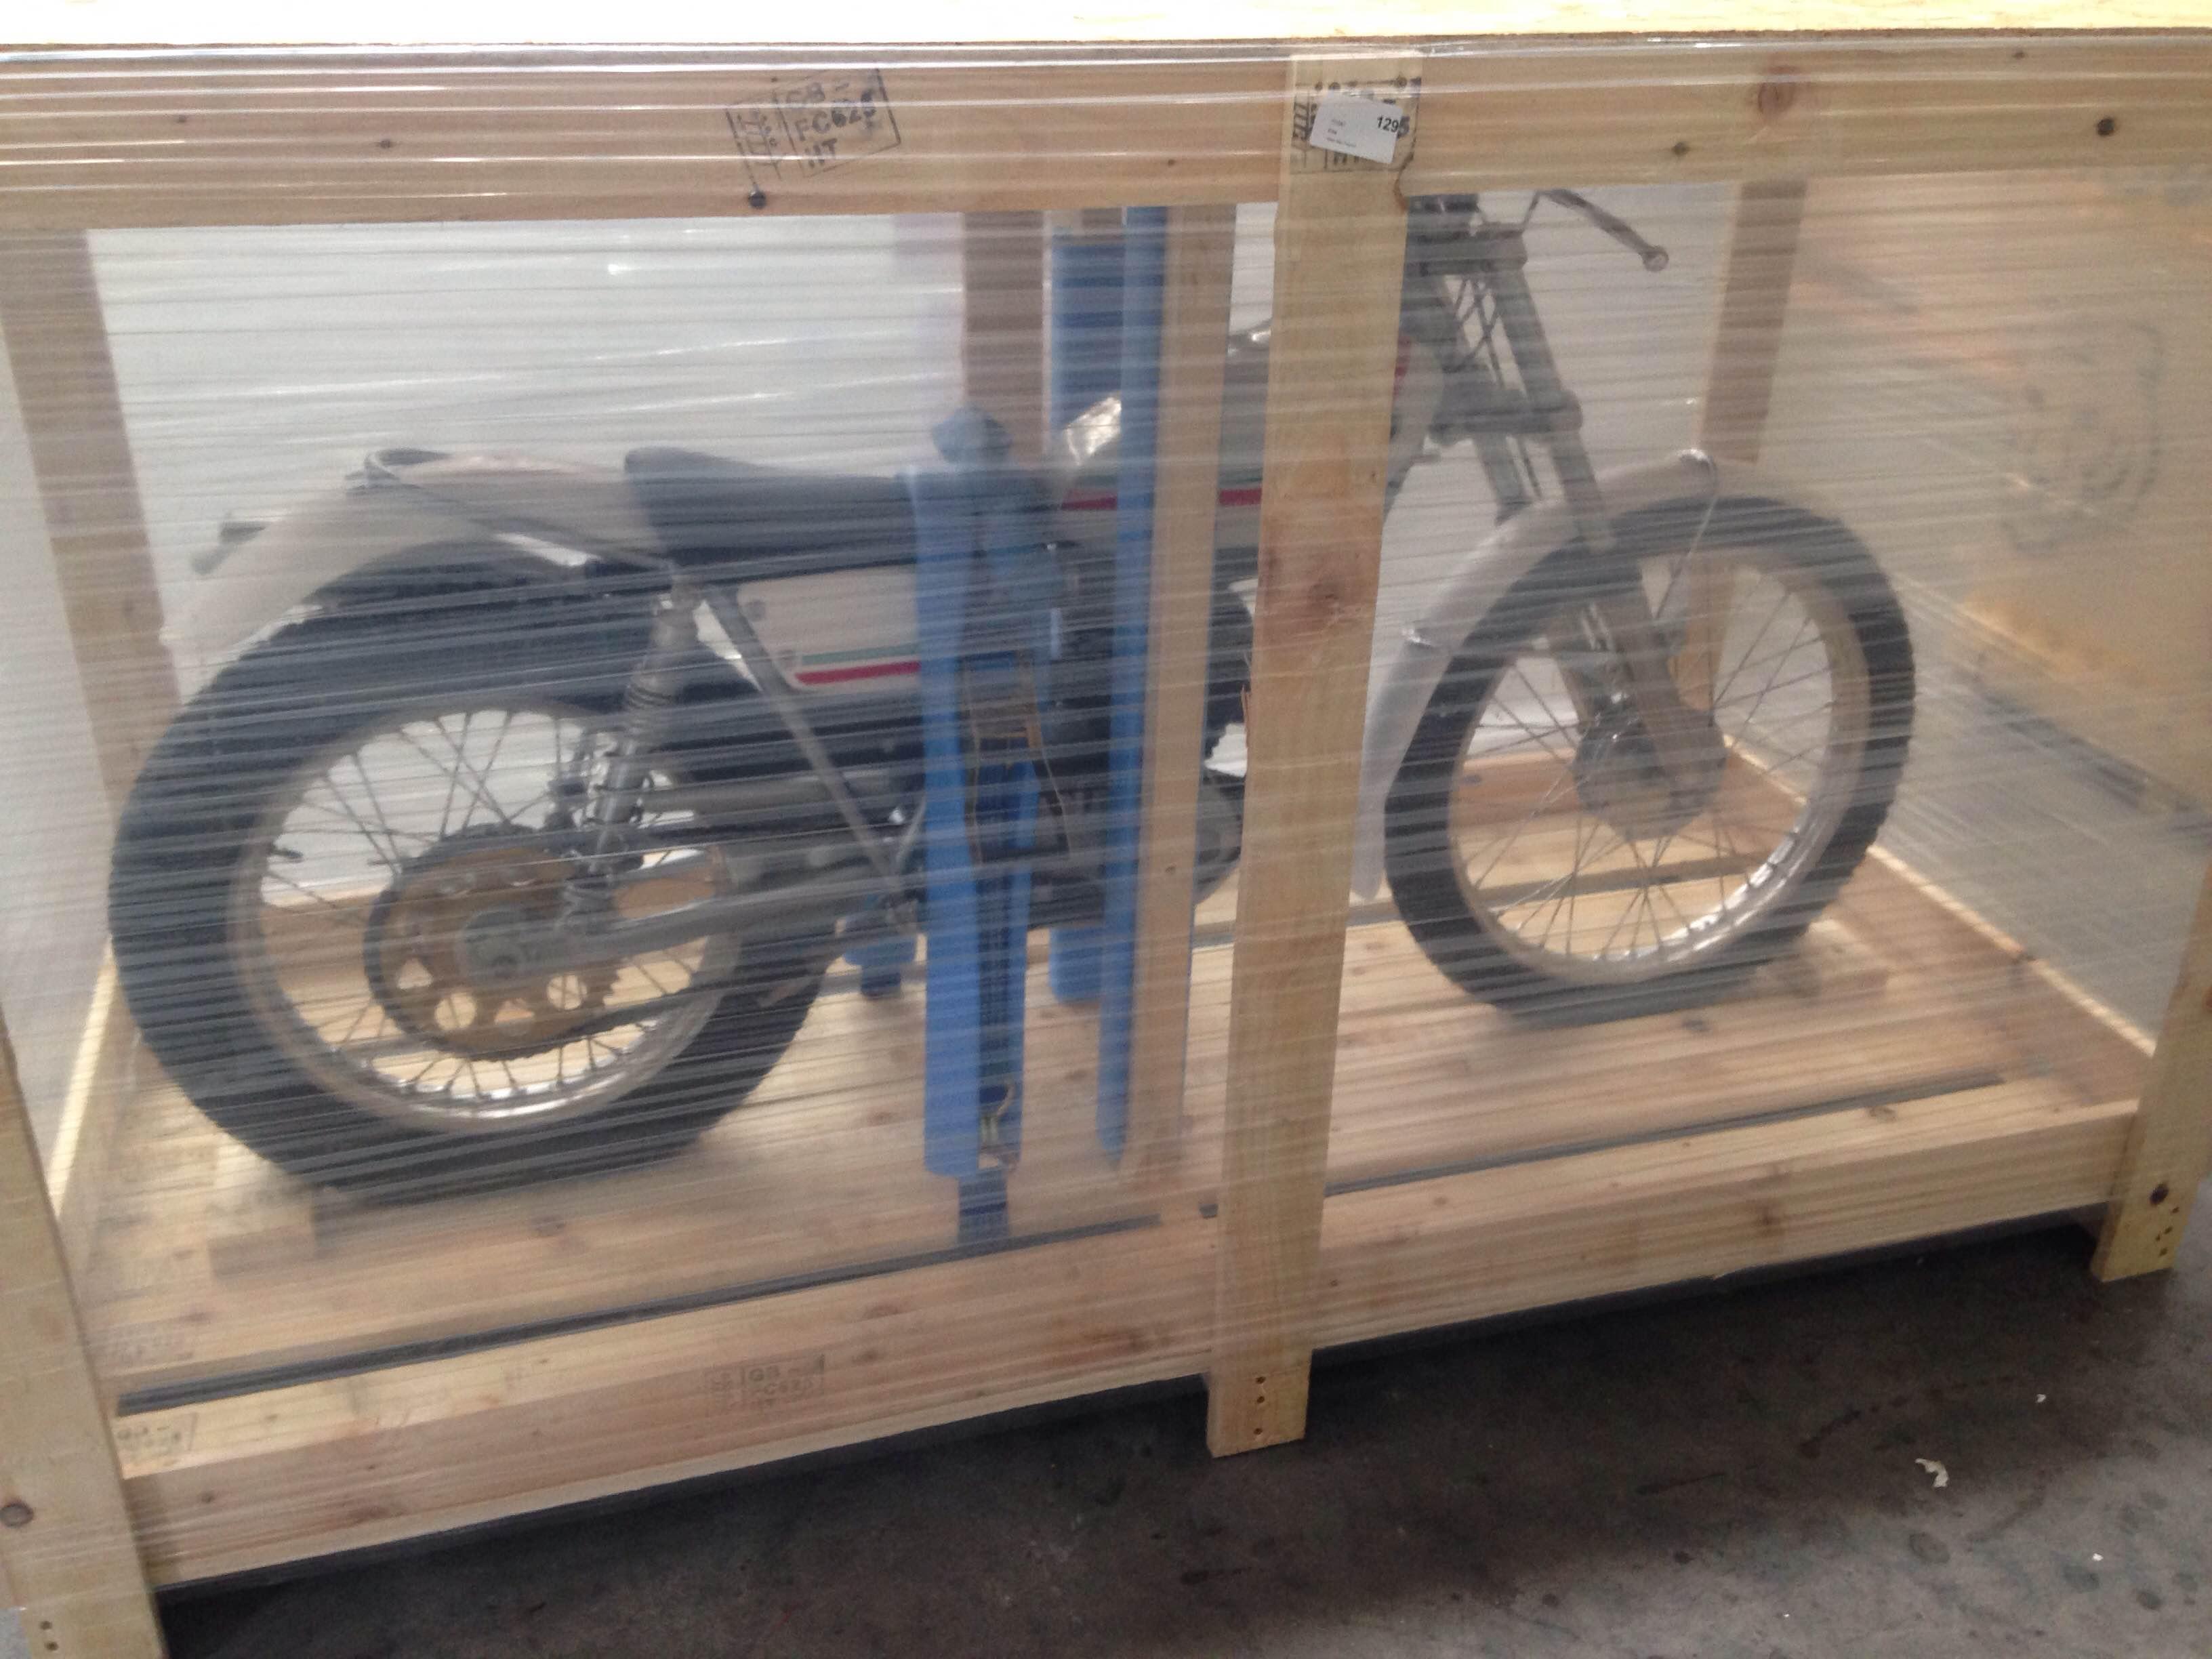 Shipping a motorbike overseas